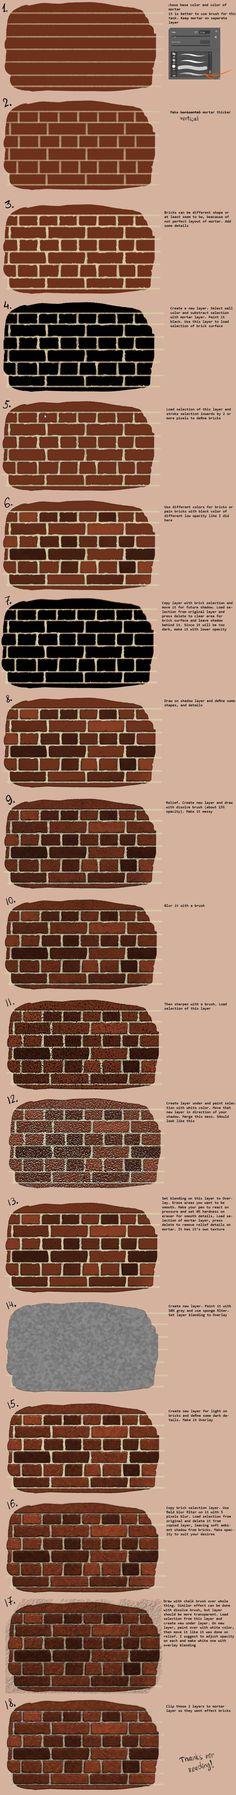 Digital art tutorial - brick wall